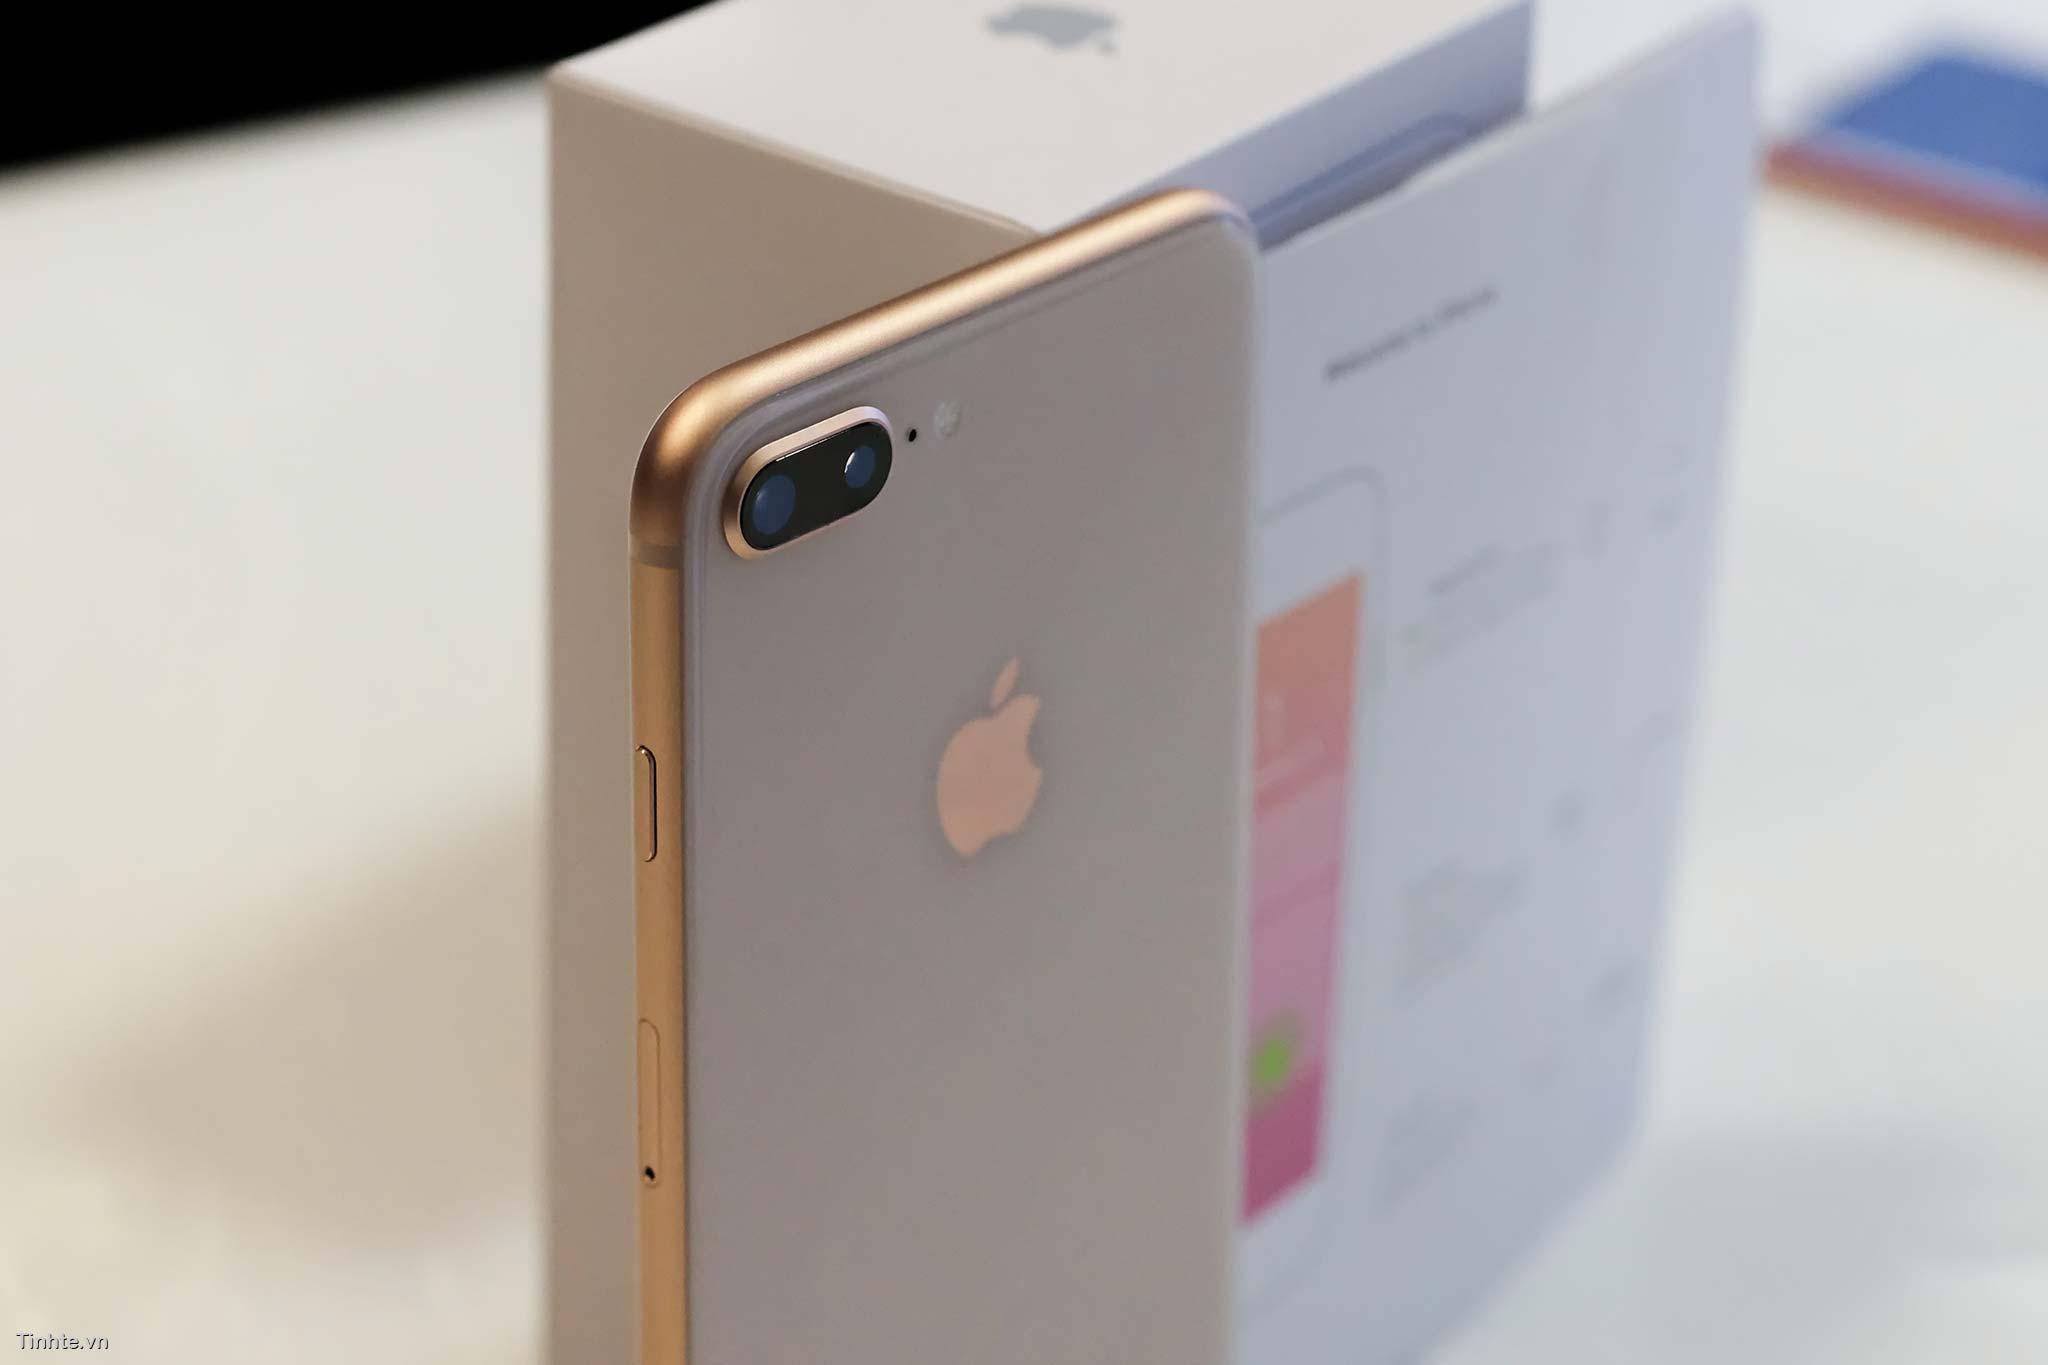 tinhte_tren_tay_apple_iphone_8_iphone8_plus1.jpg